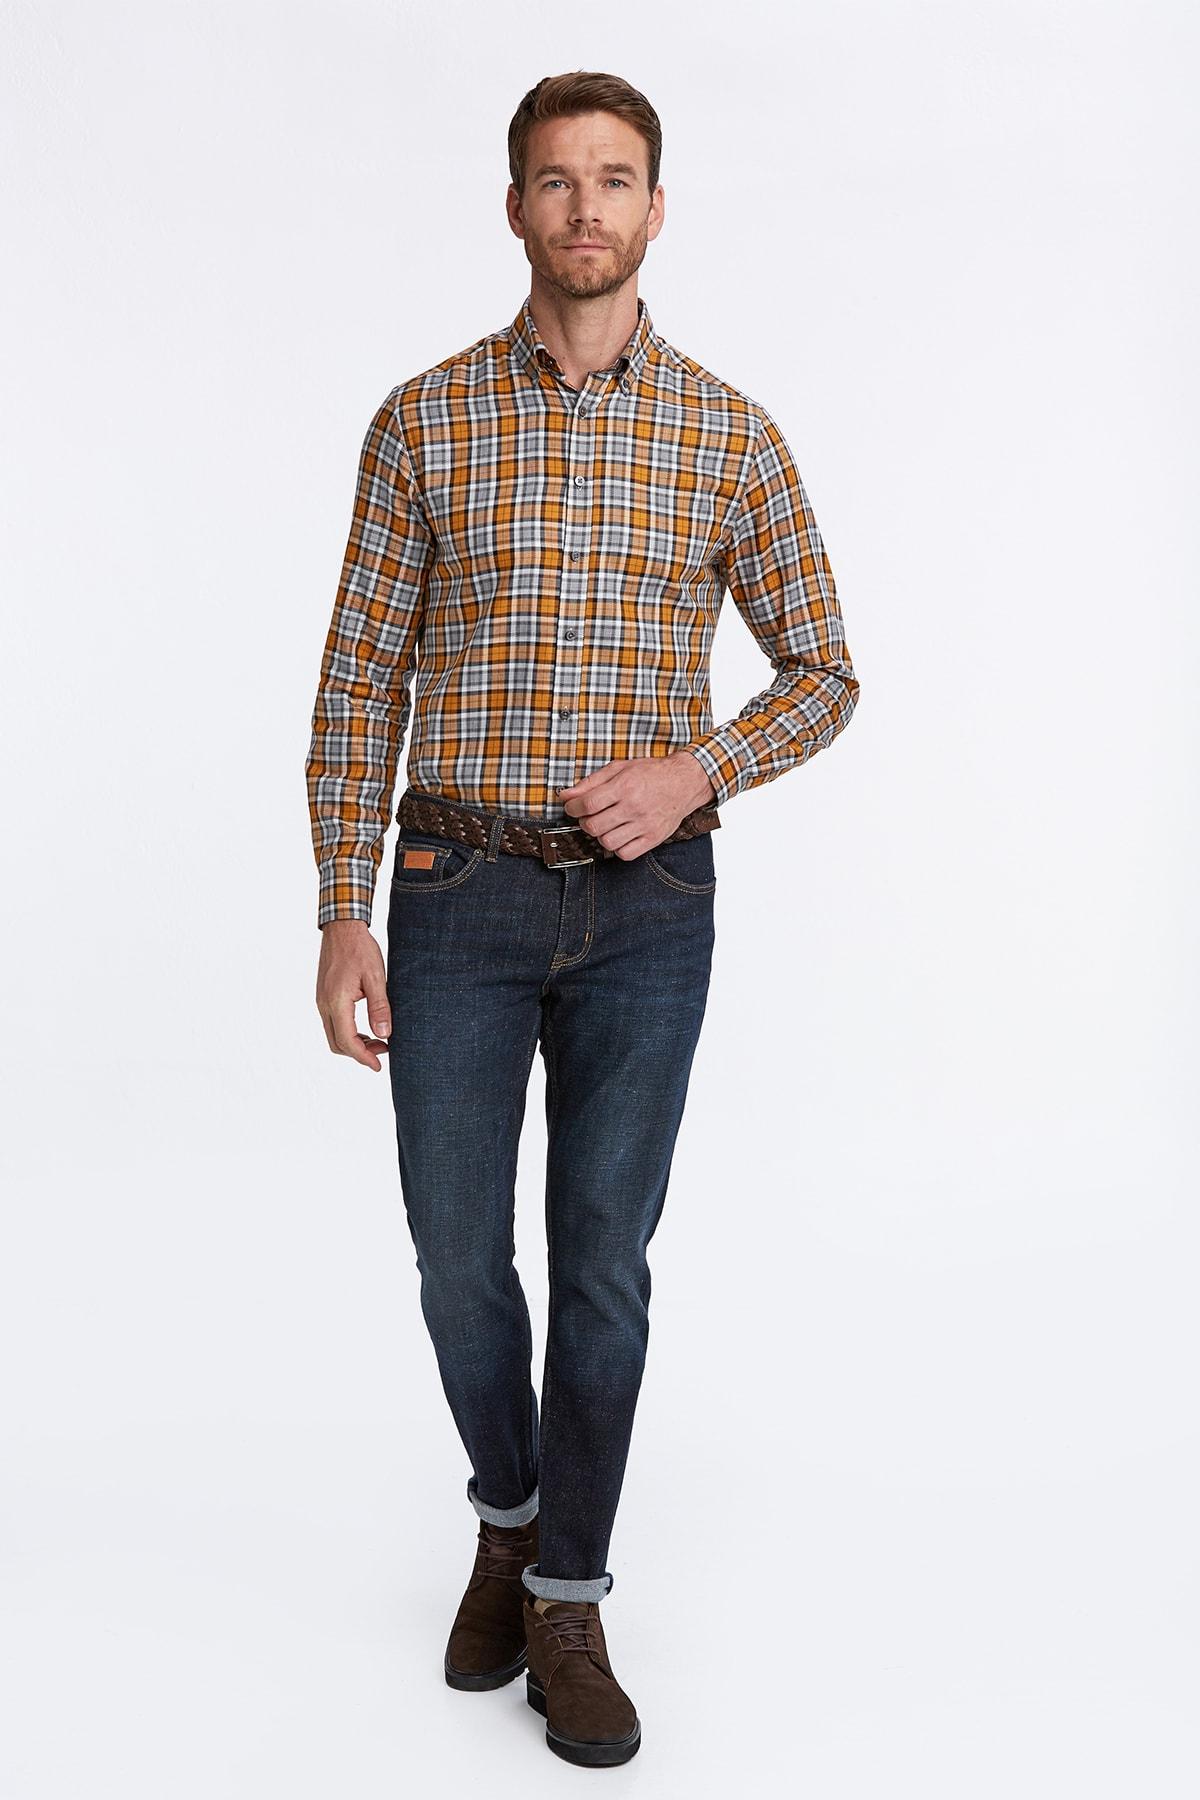 Hemington Erkek Turuncu Ekose Desen Turuncu Pamuk Gömlek 2